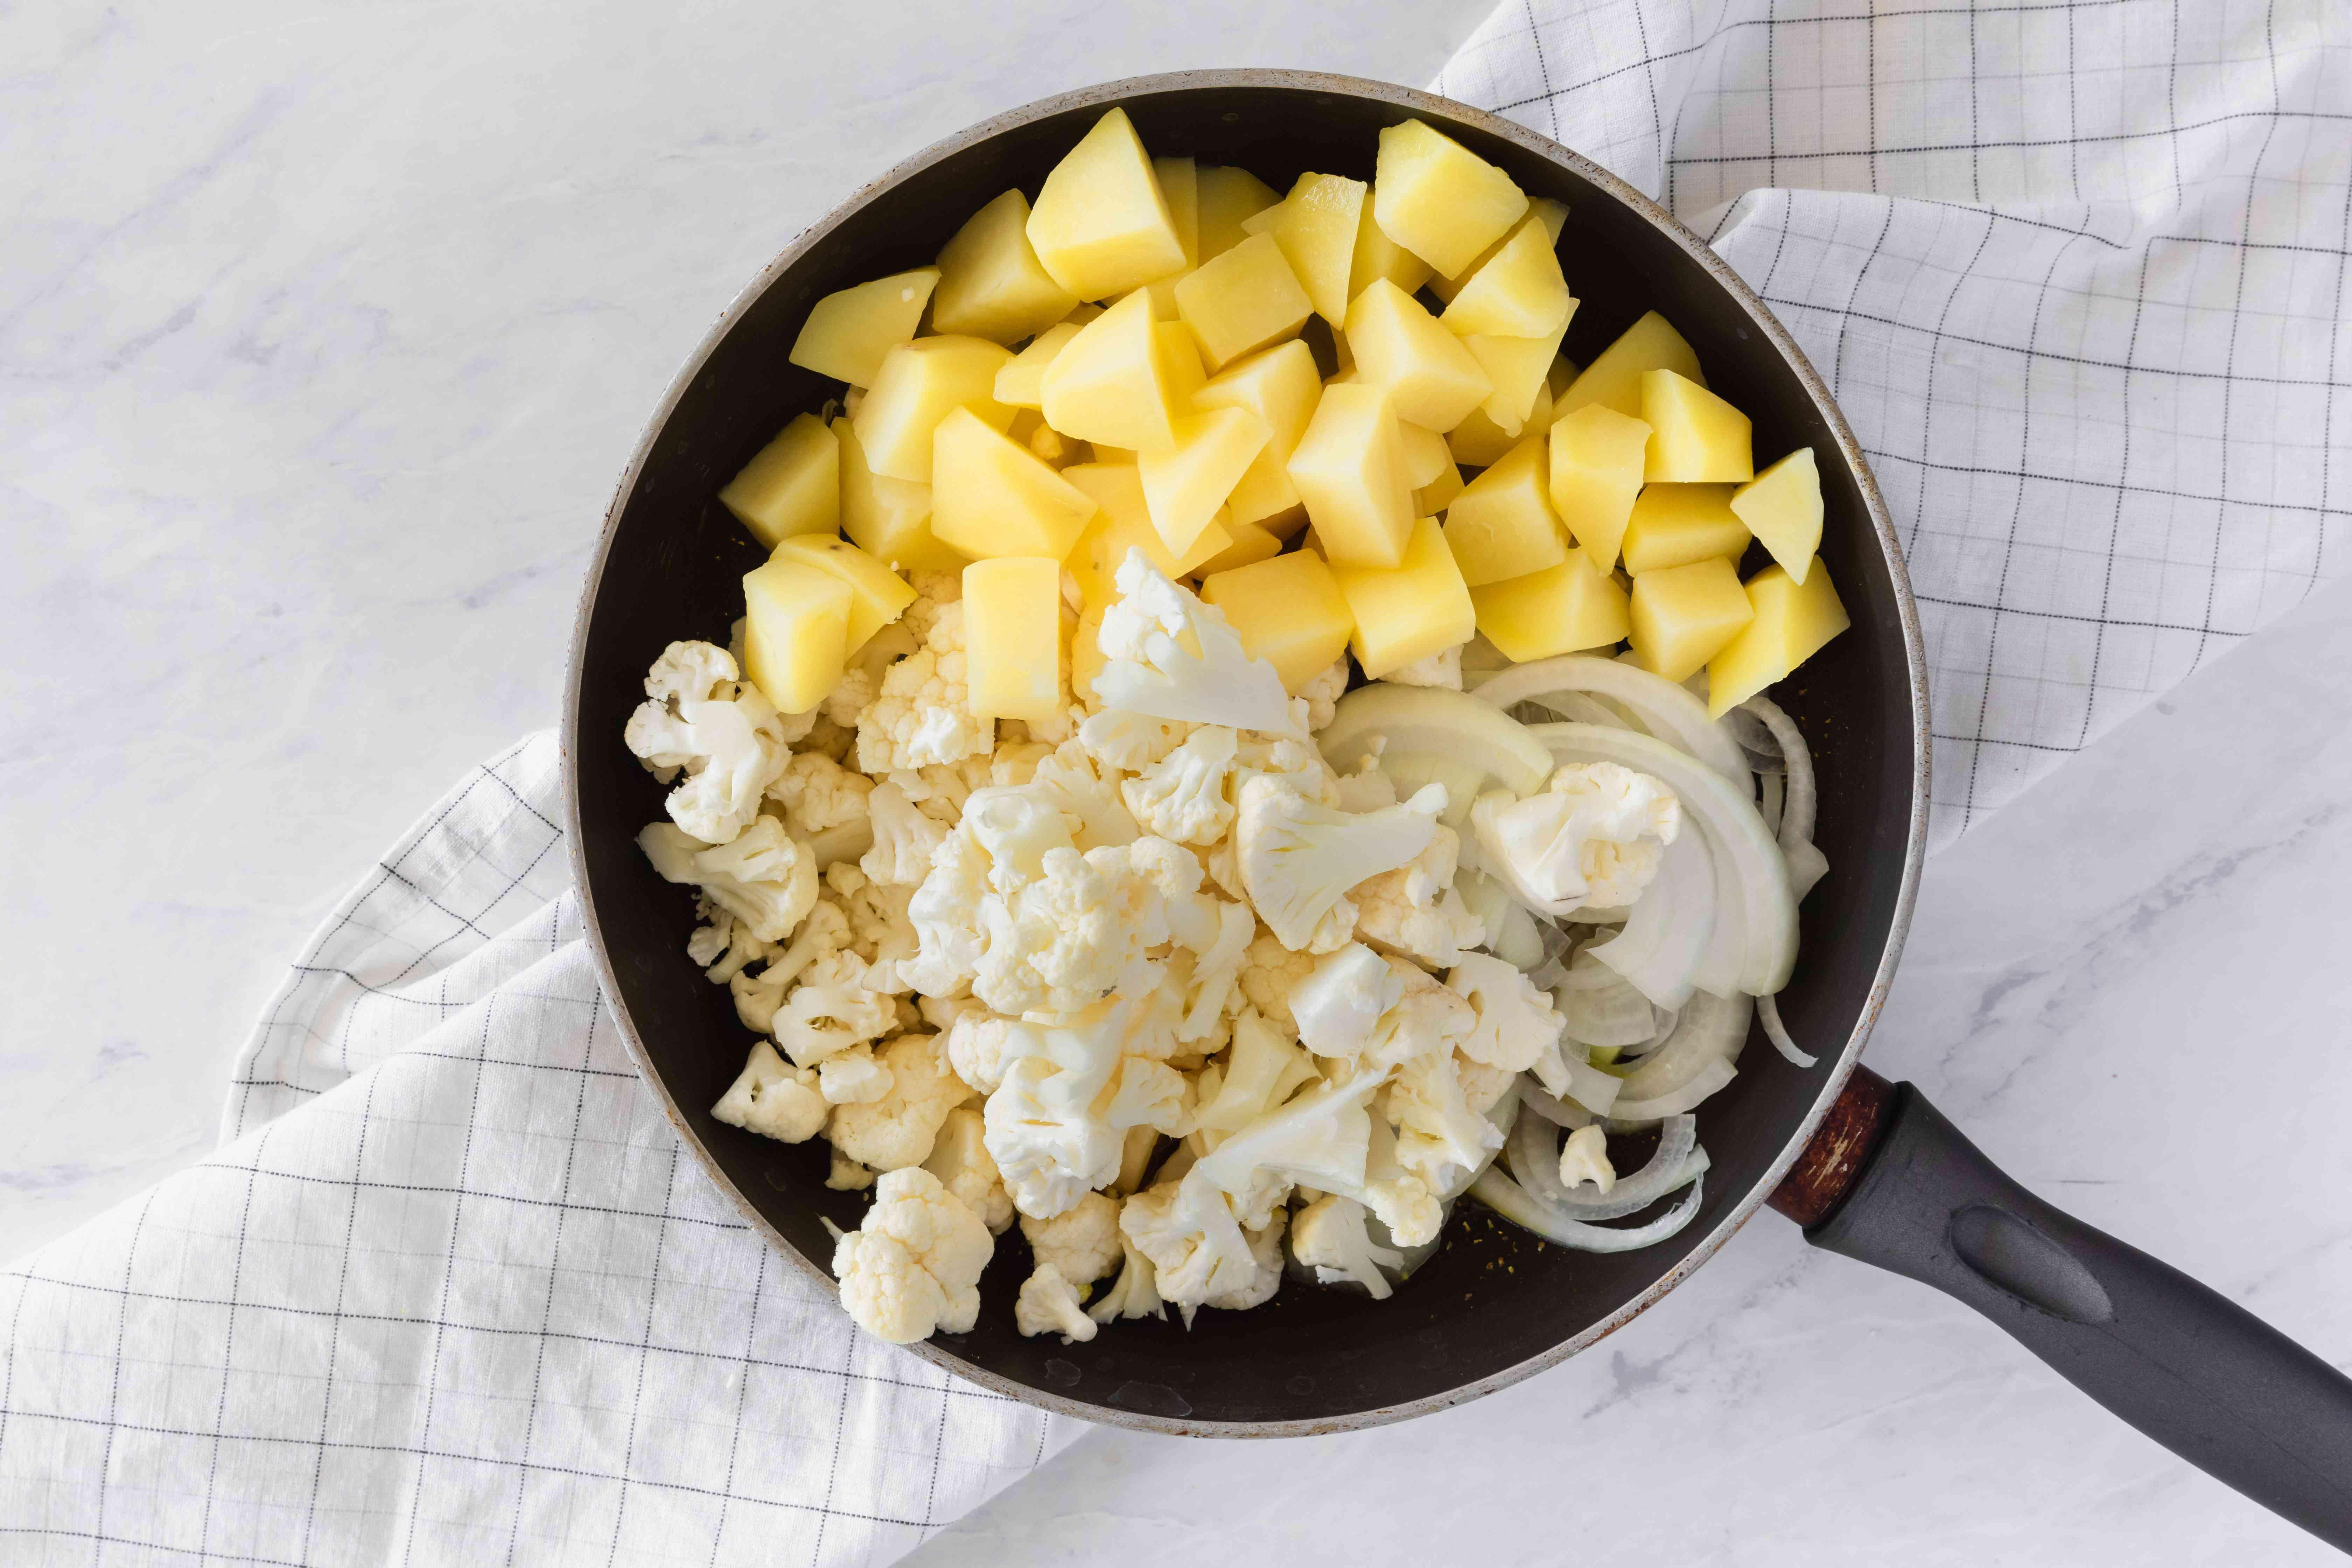 Add potatoes and cauliflower